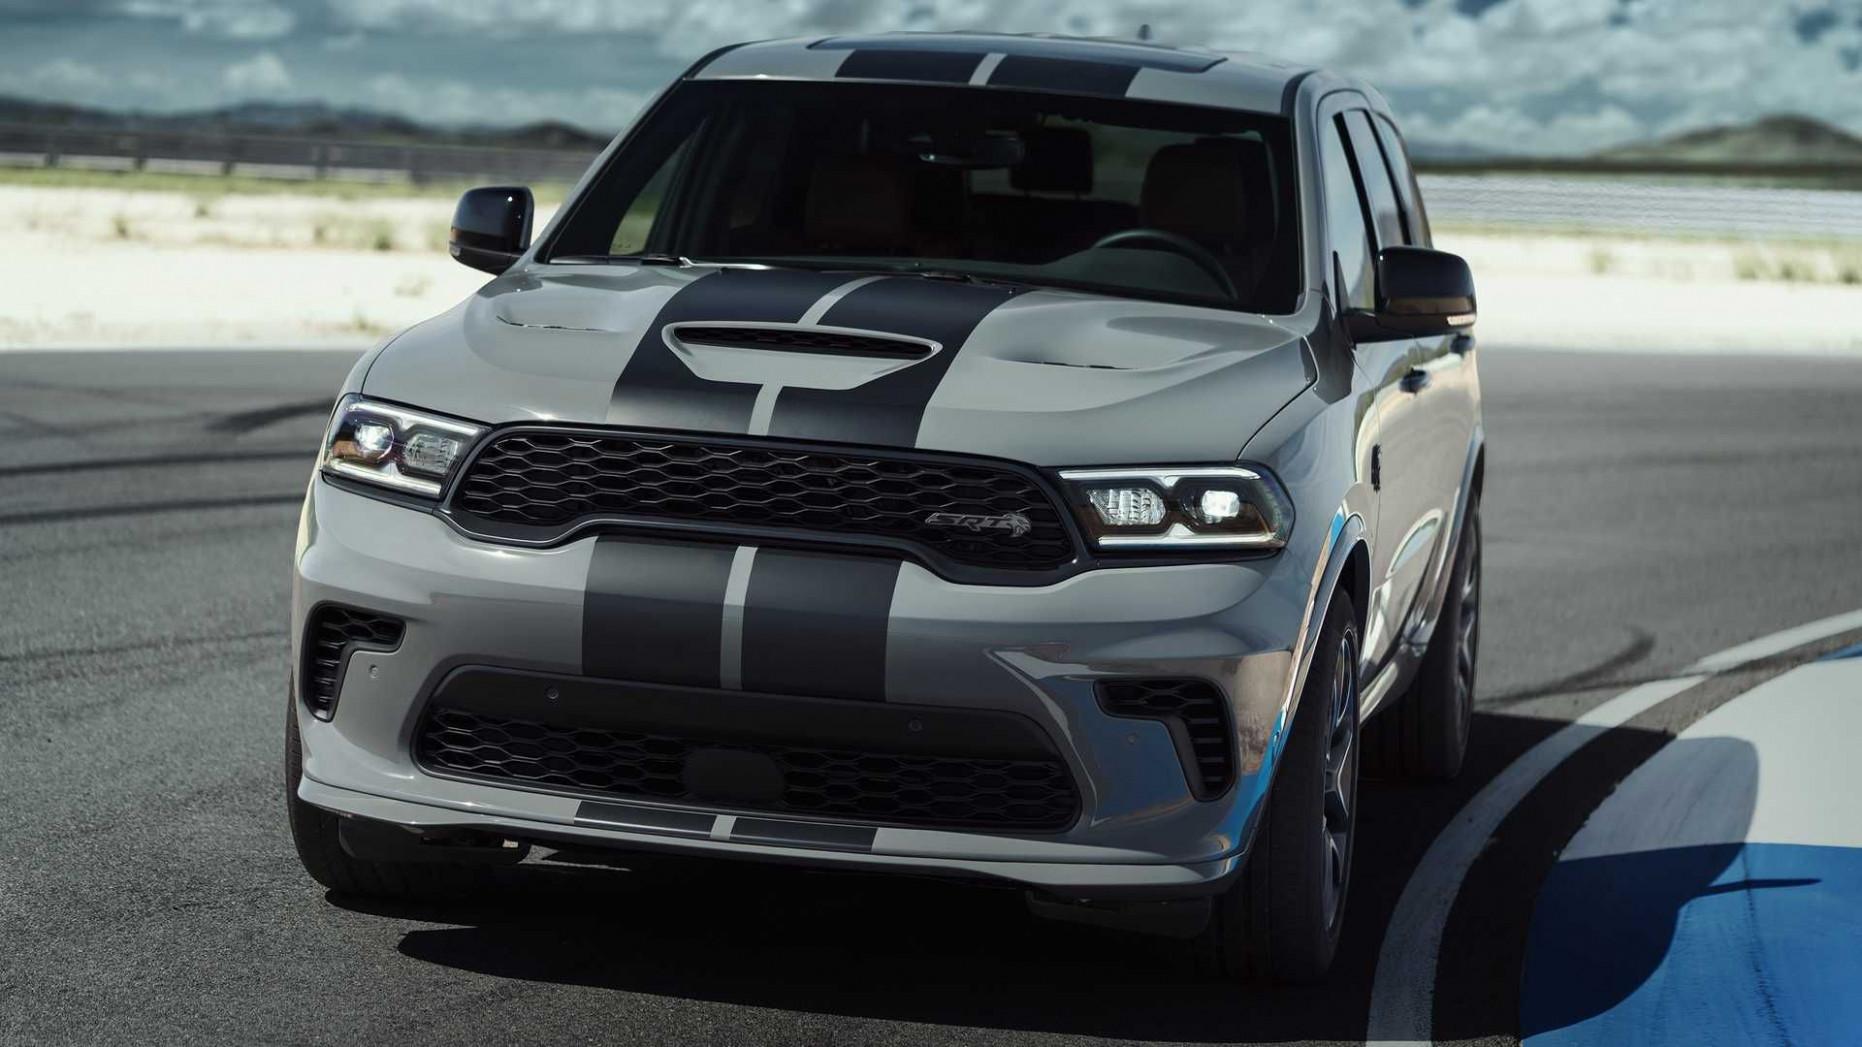 New Concept 2022 Dodge Challenger Srt